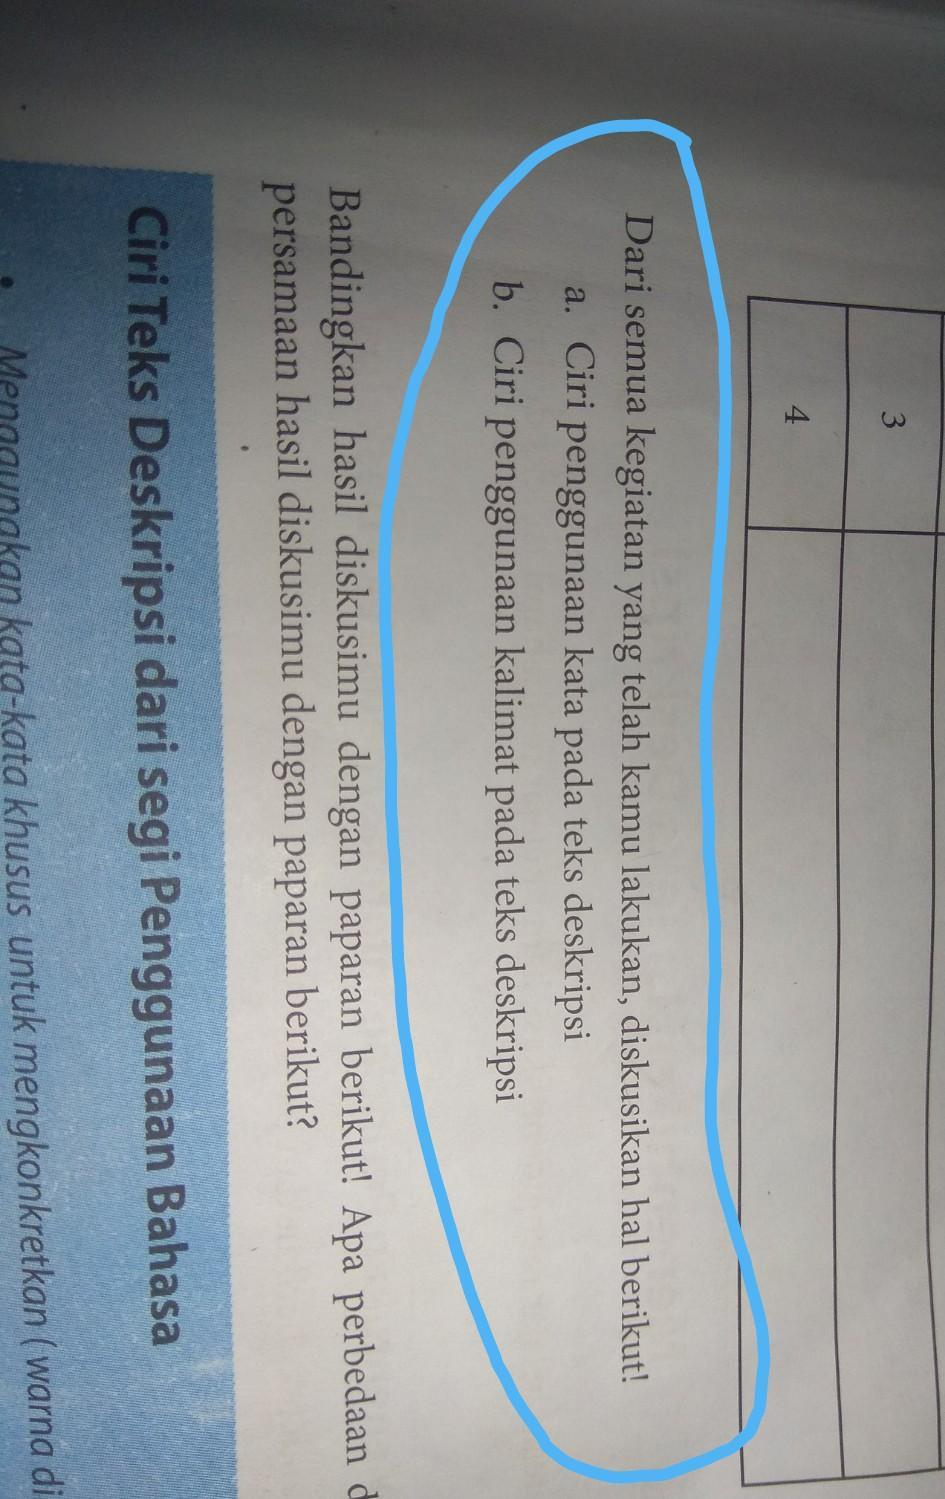 Jawaban Bahasa Indonesia Kelas 7 Semester 1 Halaman 11 Brainly Co Id